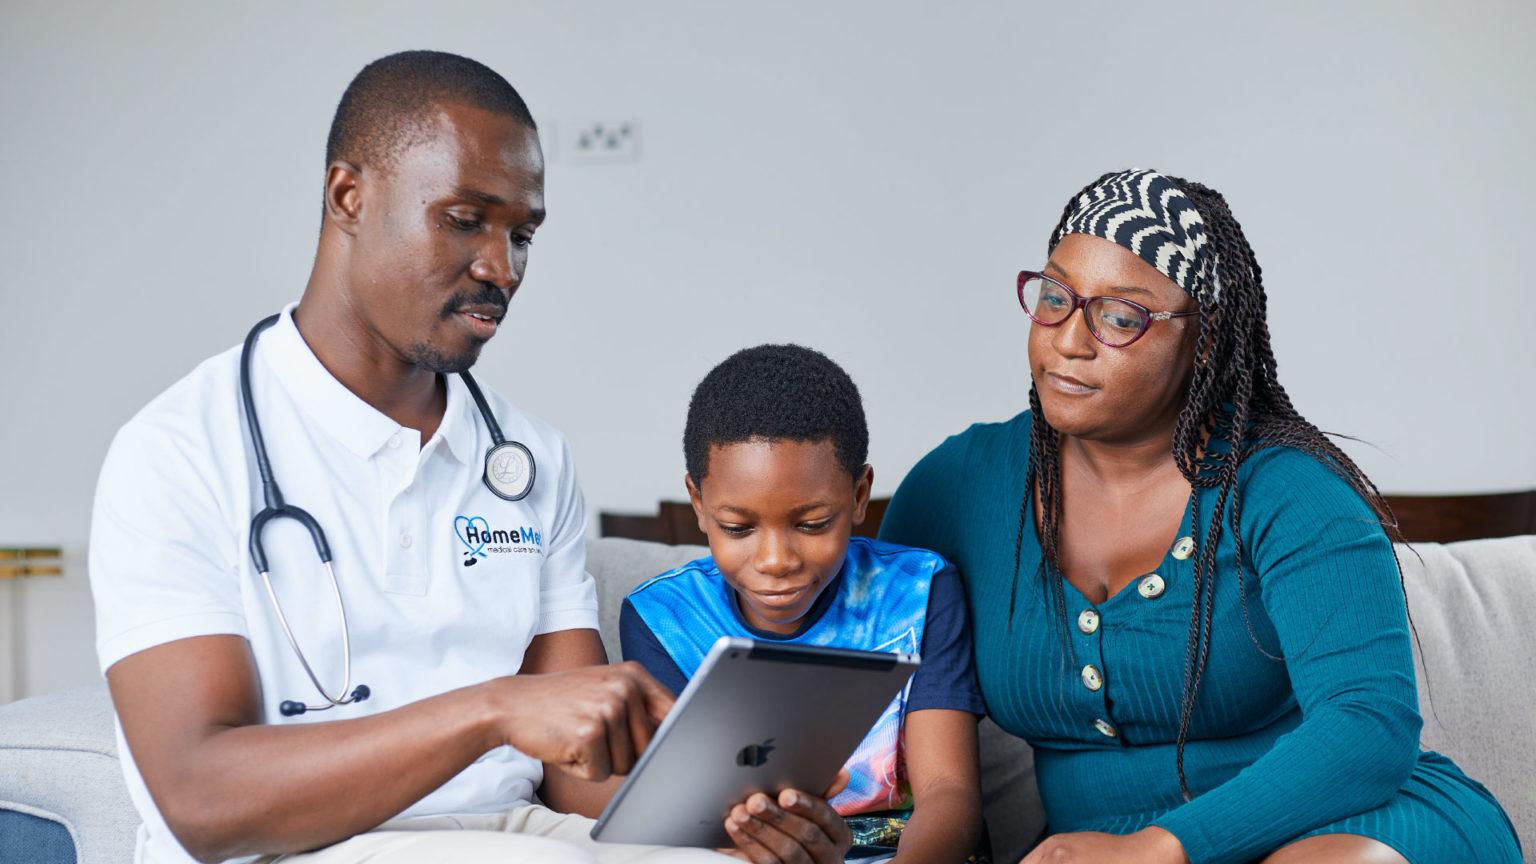 HomeMed-What-we-do-2-healthcare